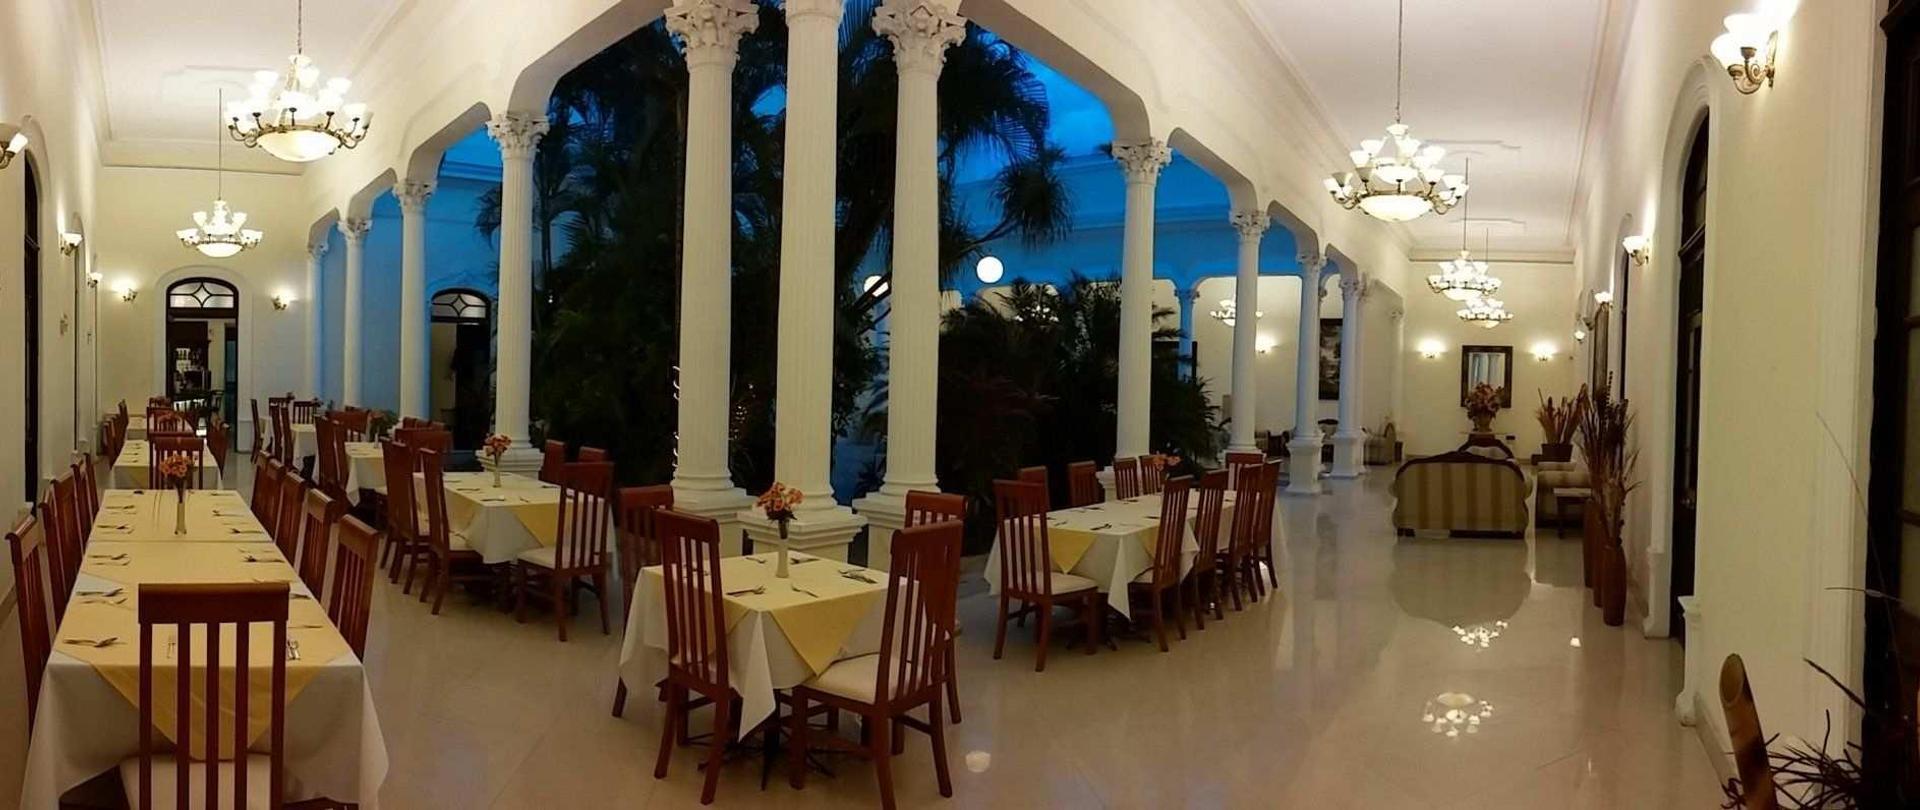 lobby-restaurante.jpg